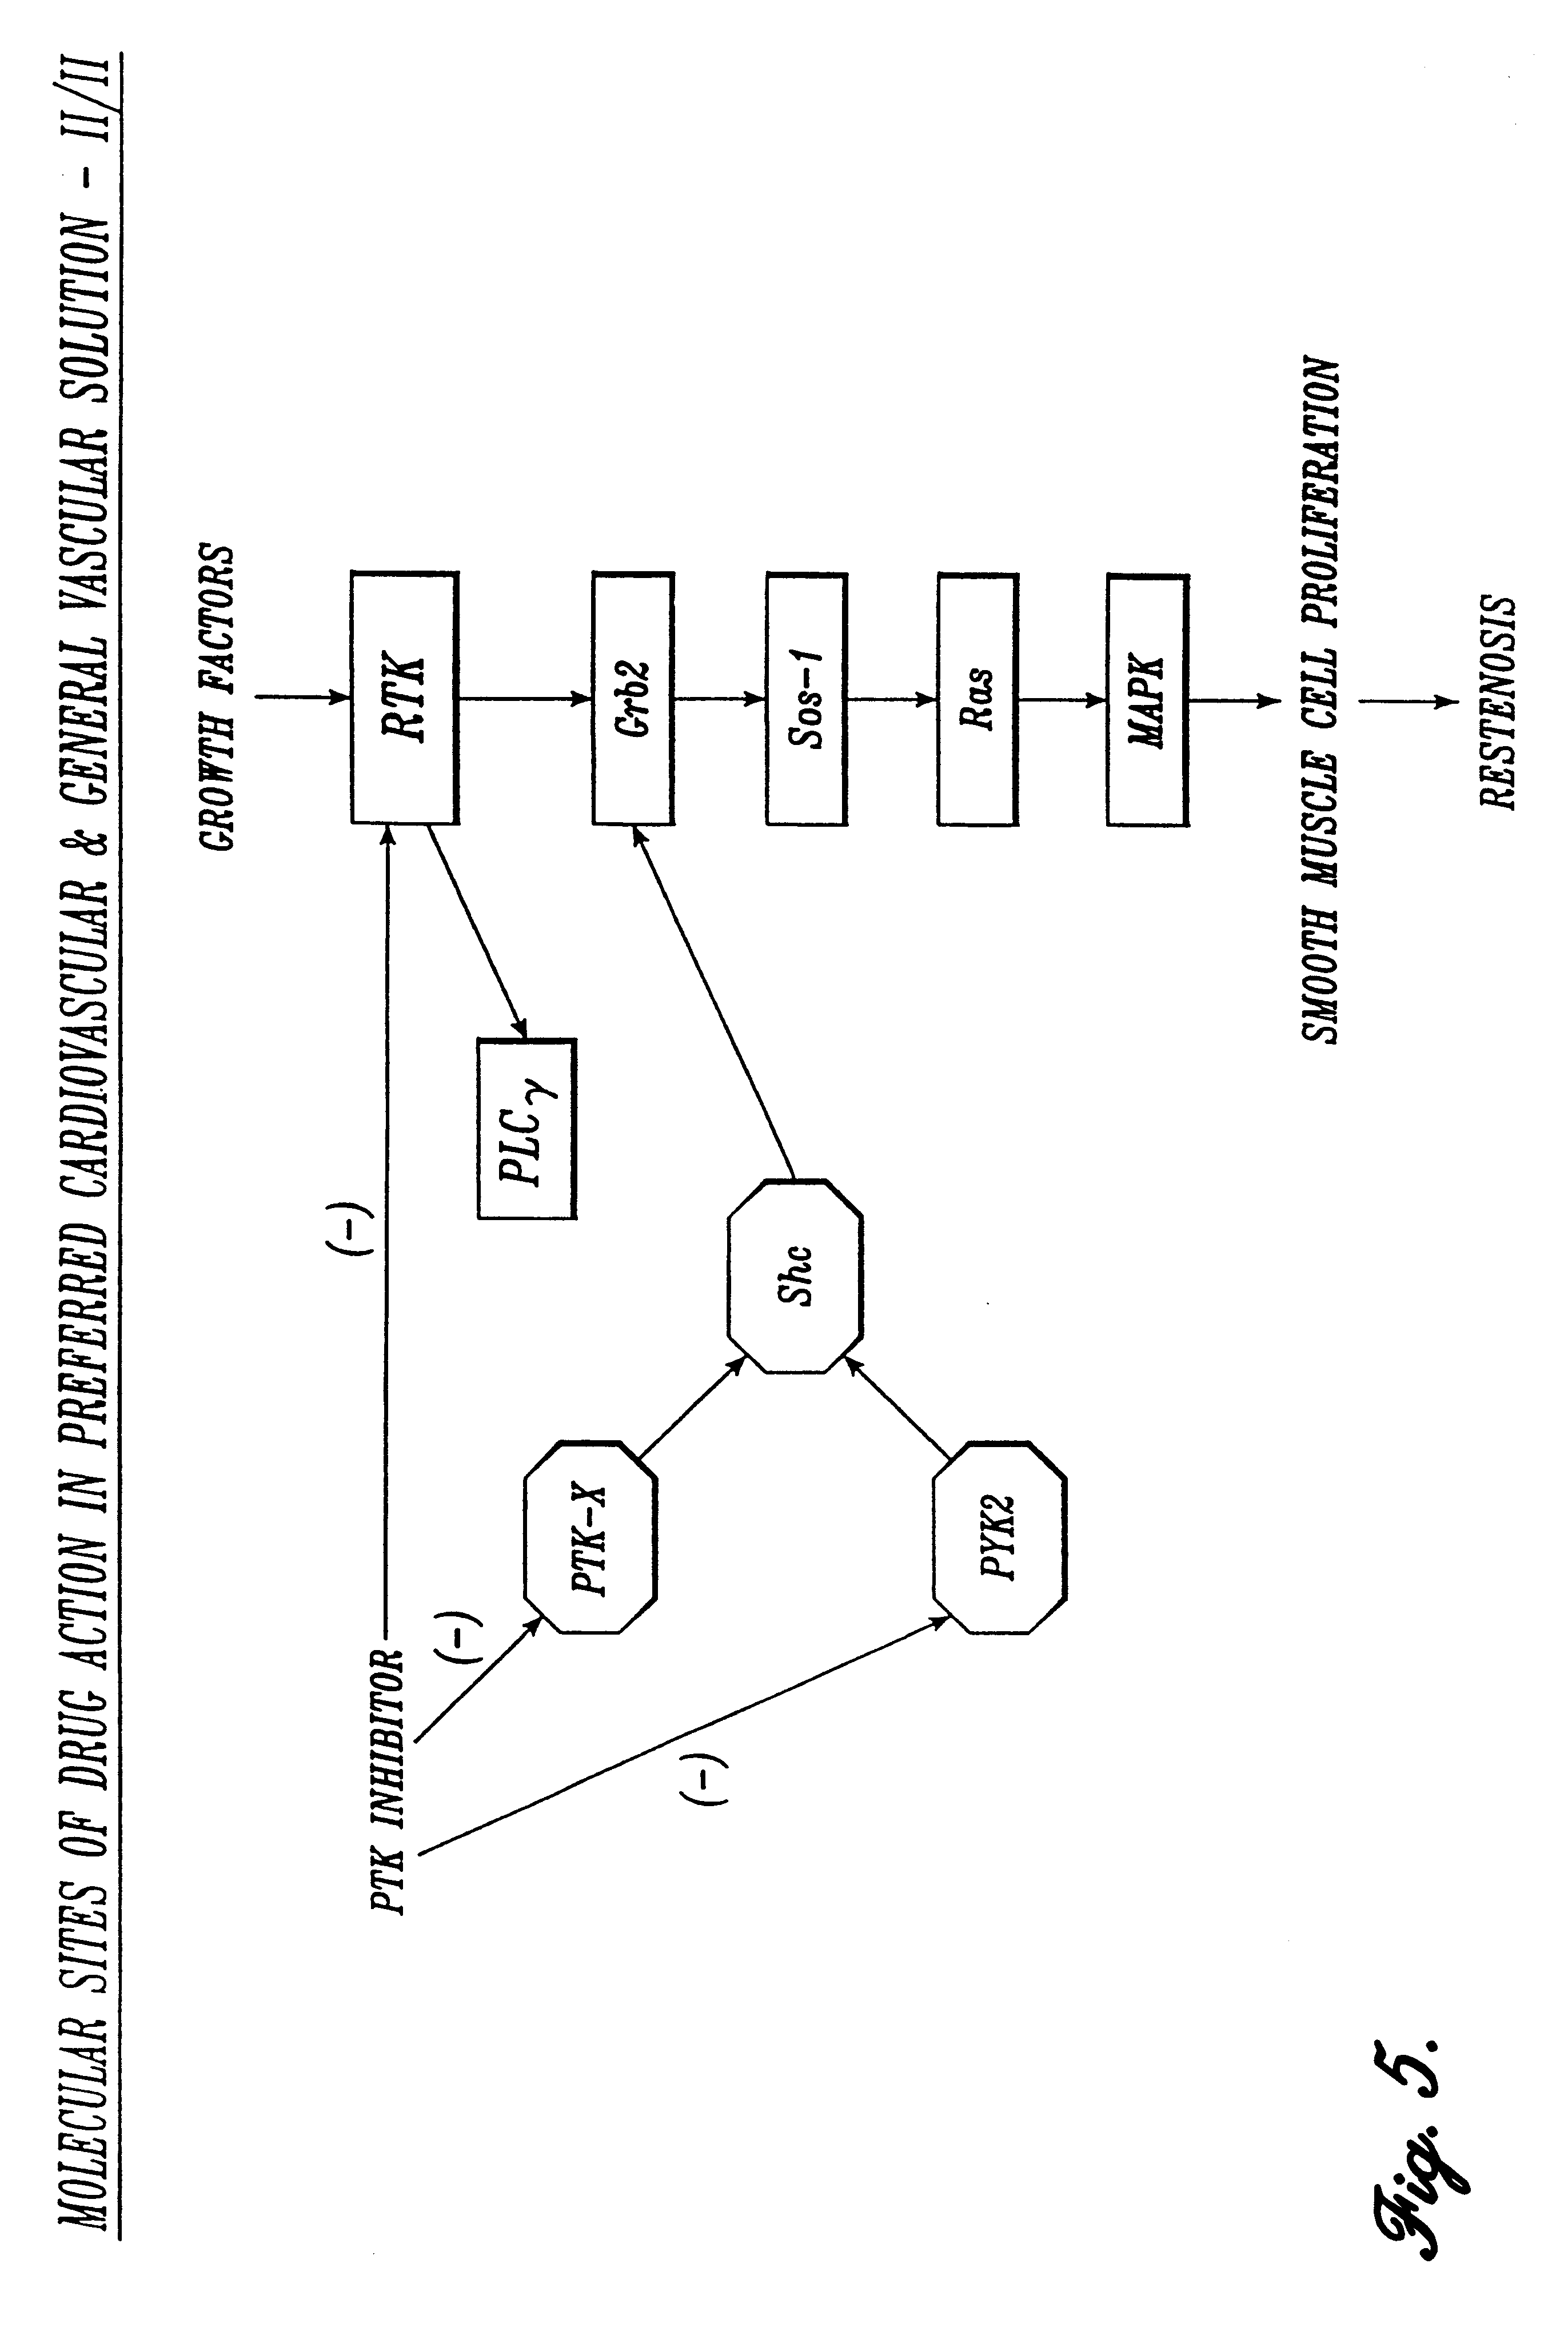 neurokinin-1 antagonist dopamine antagonist and corticosteroid